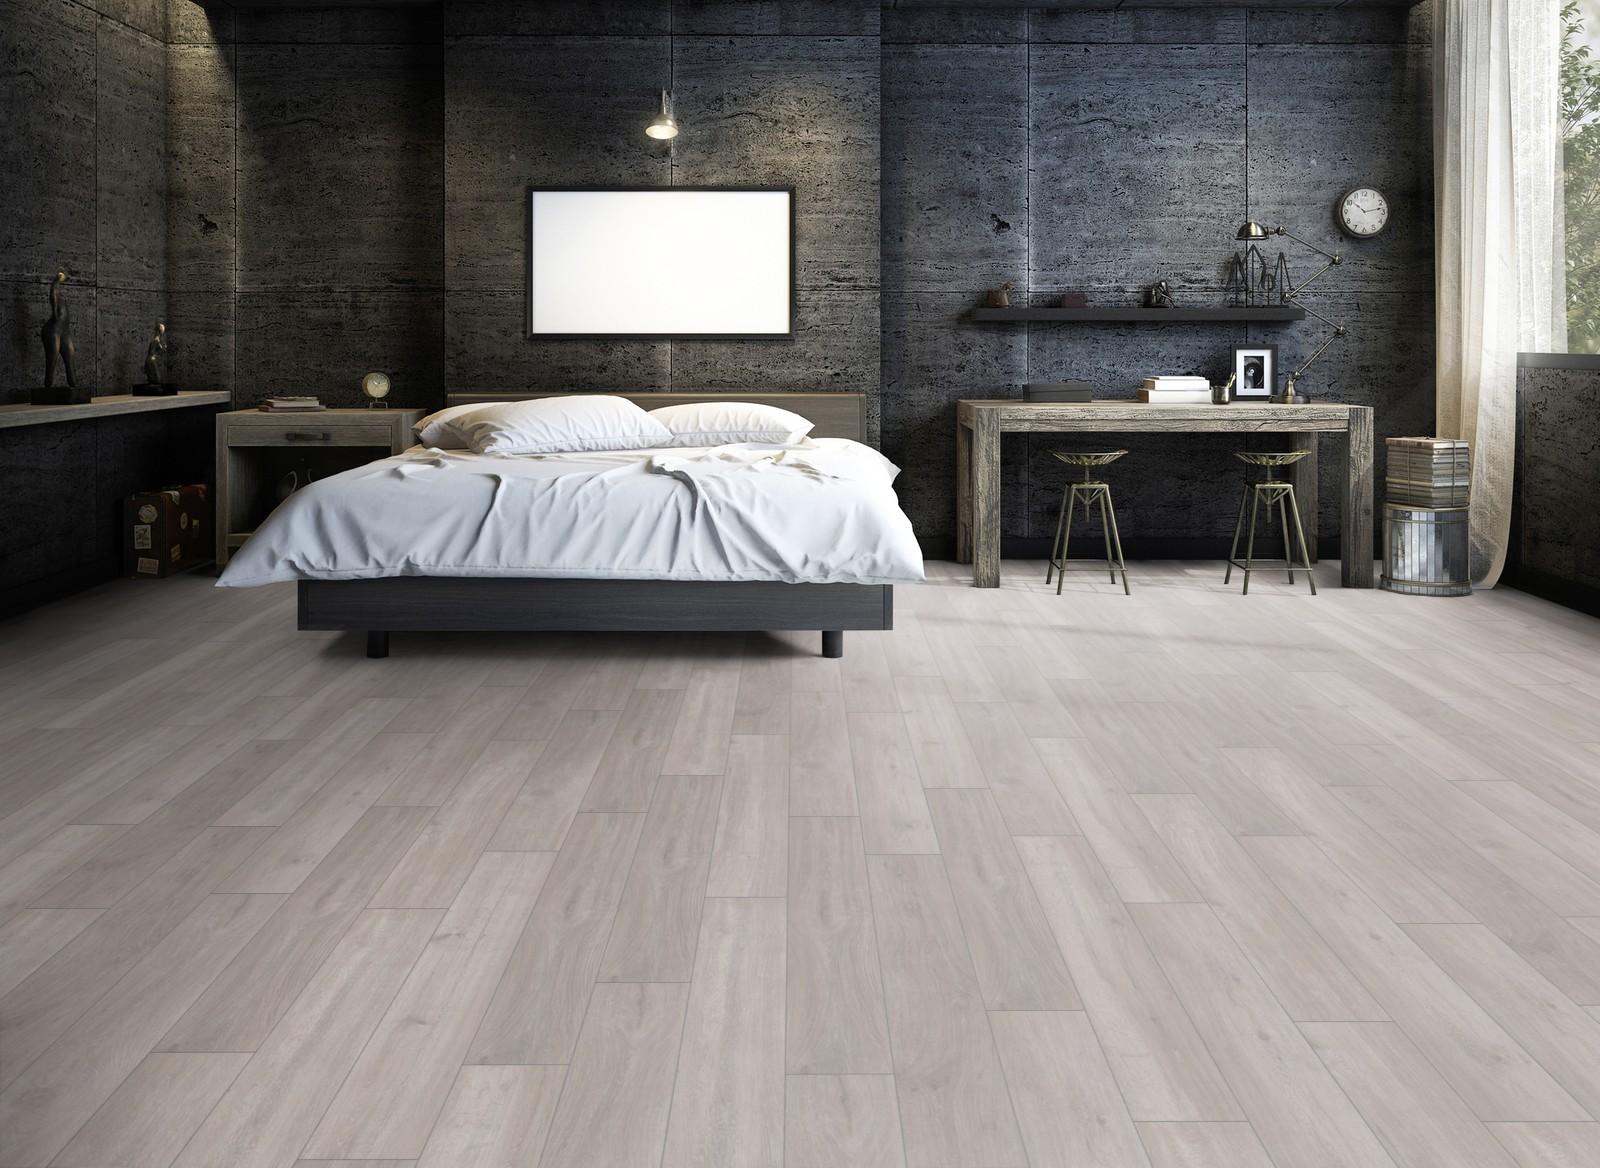 Le04 Ter Hürne Oak Silver Grey Laminate Plank Bedroom